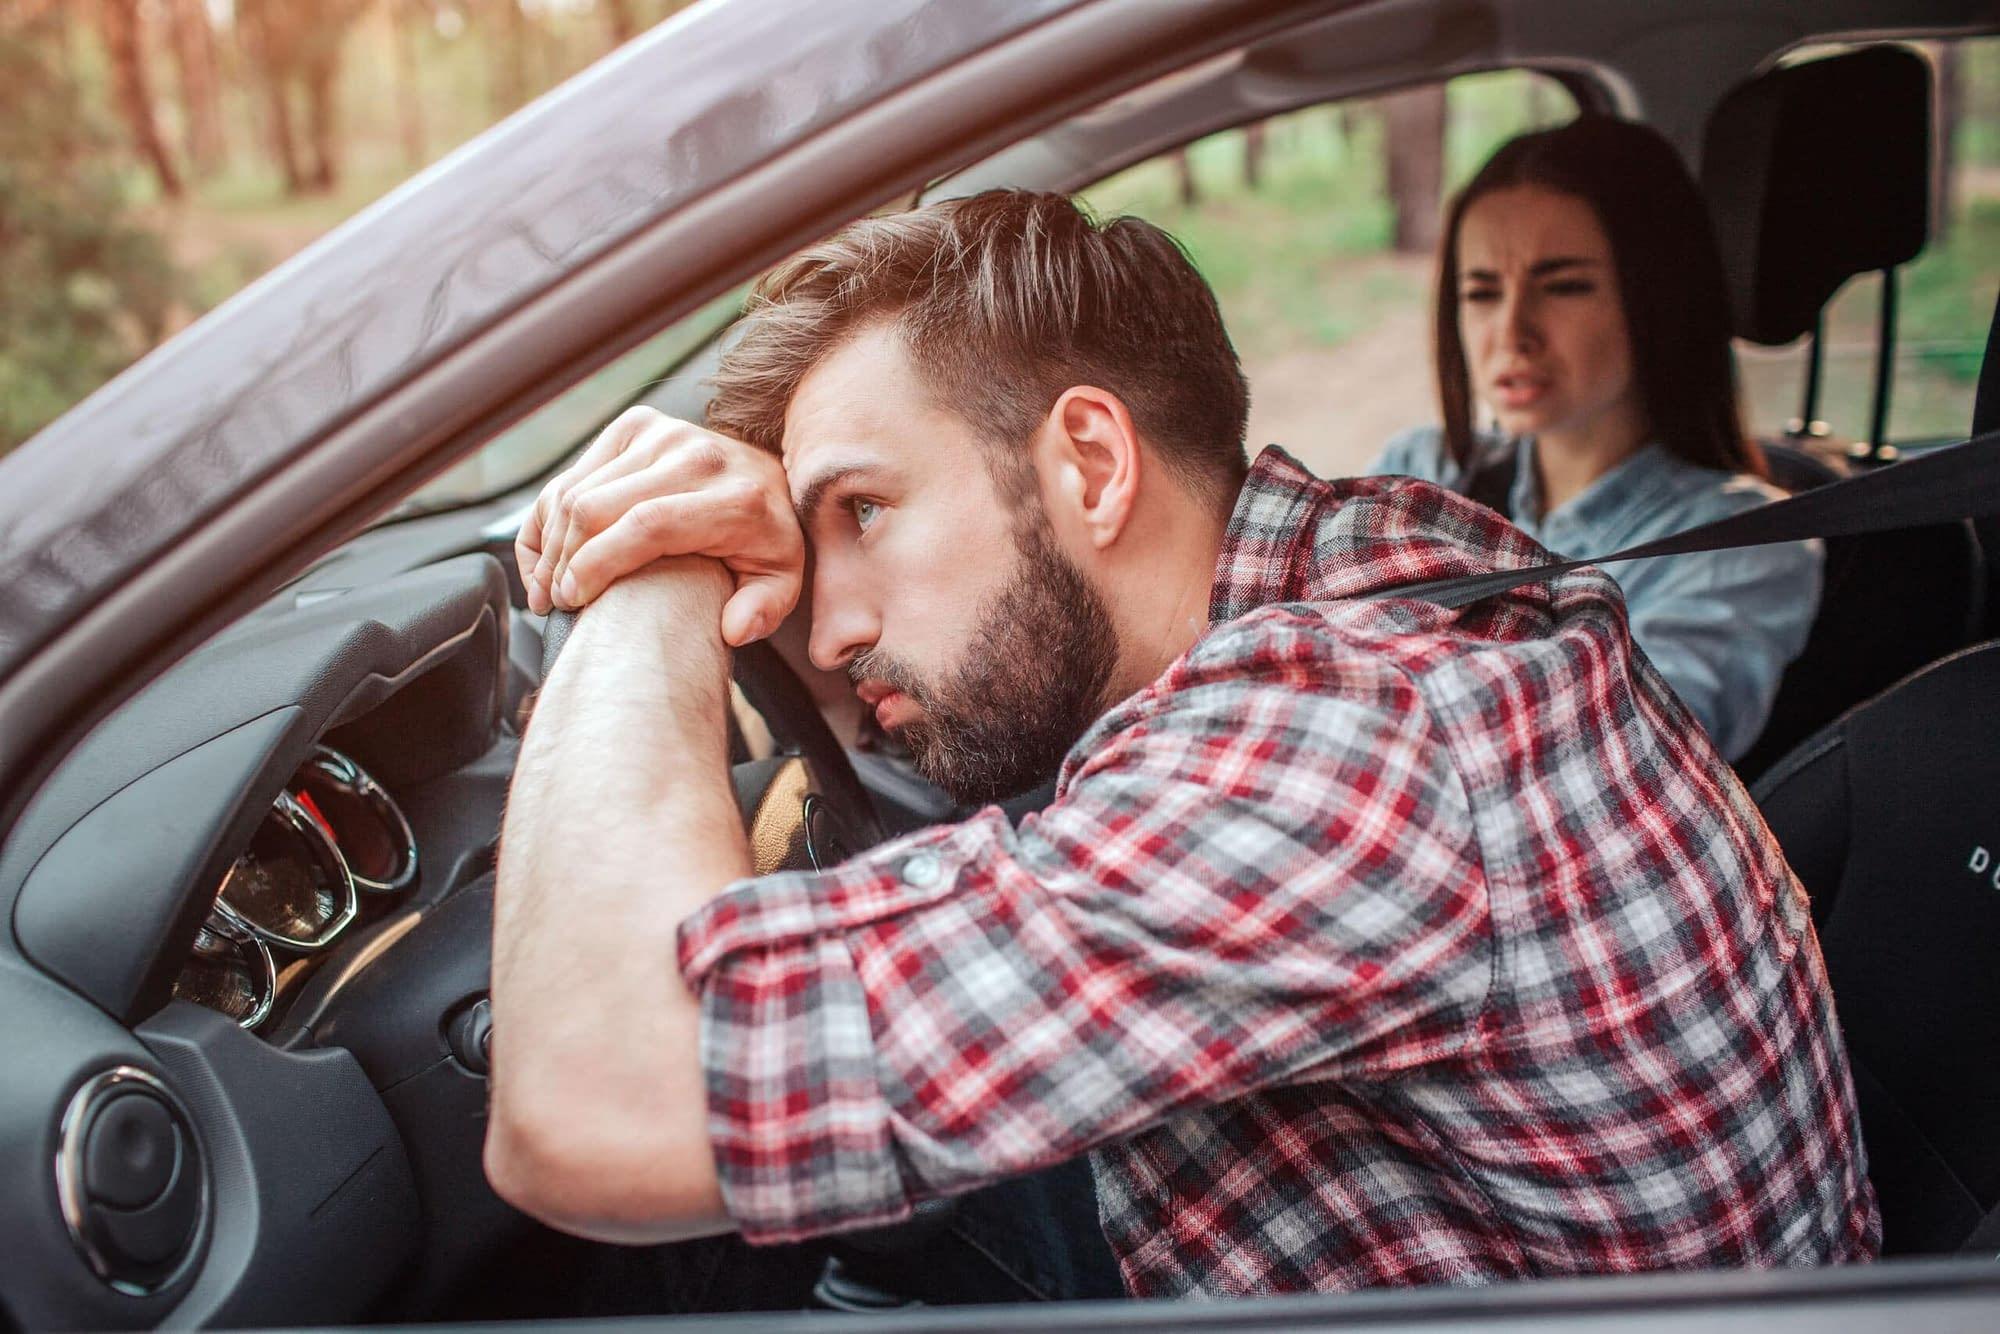 Wife abusing husband